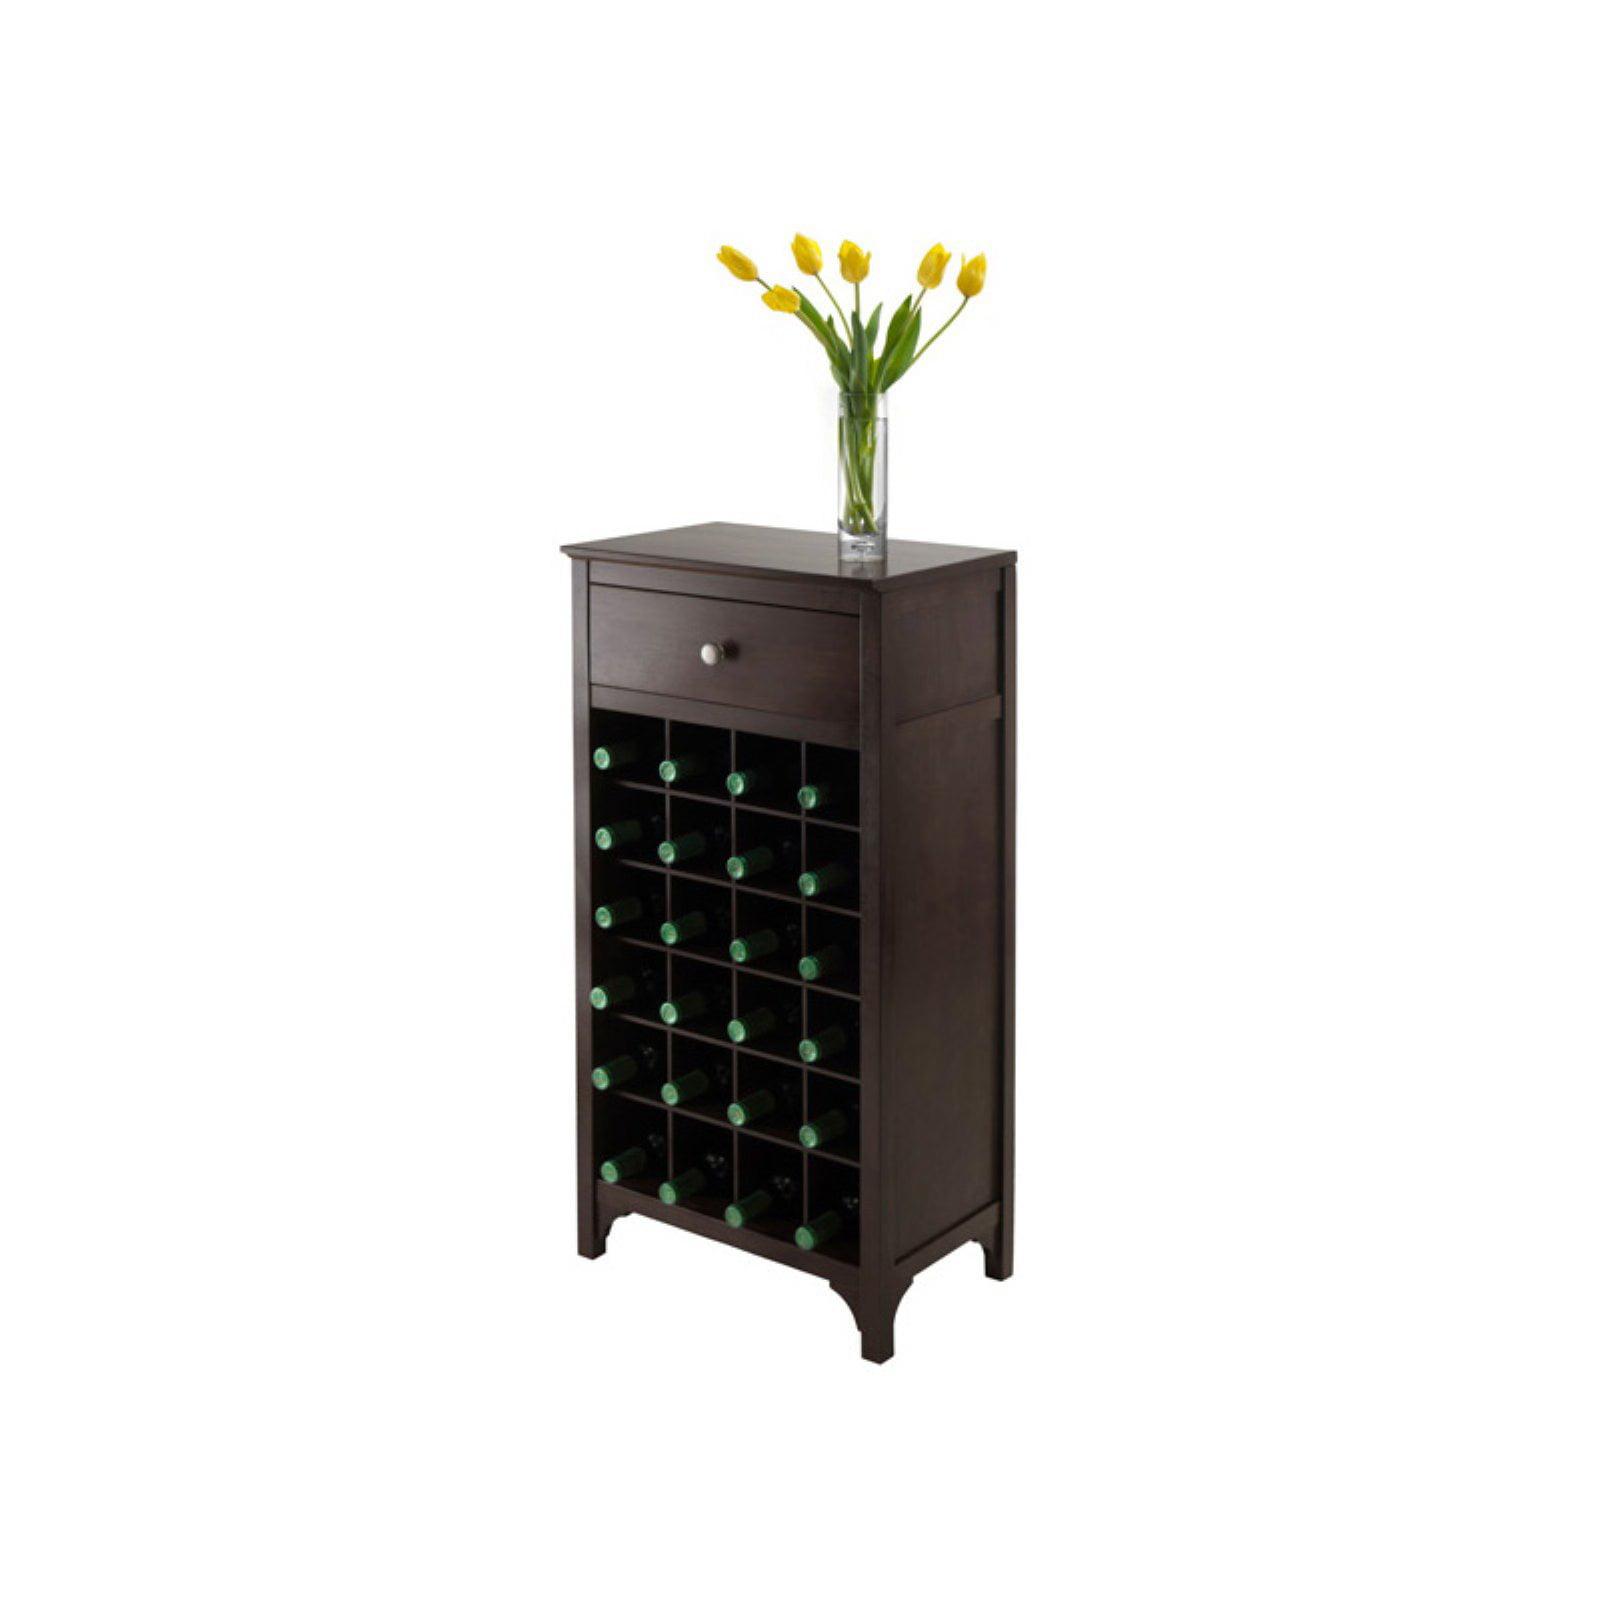 Ancona Modular Wine Cabinet, Drawer, 24-Bottle, Dark Espresso by Generic